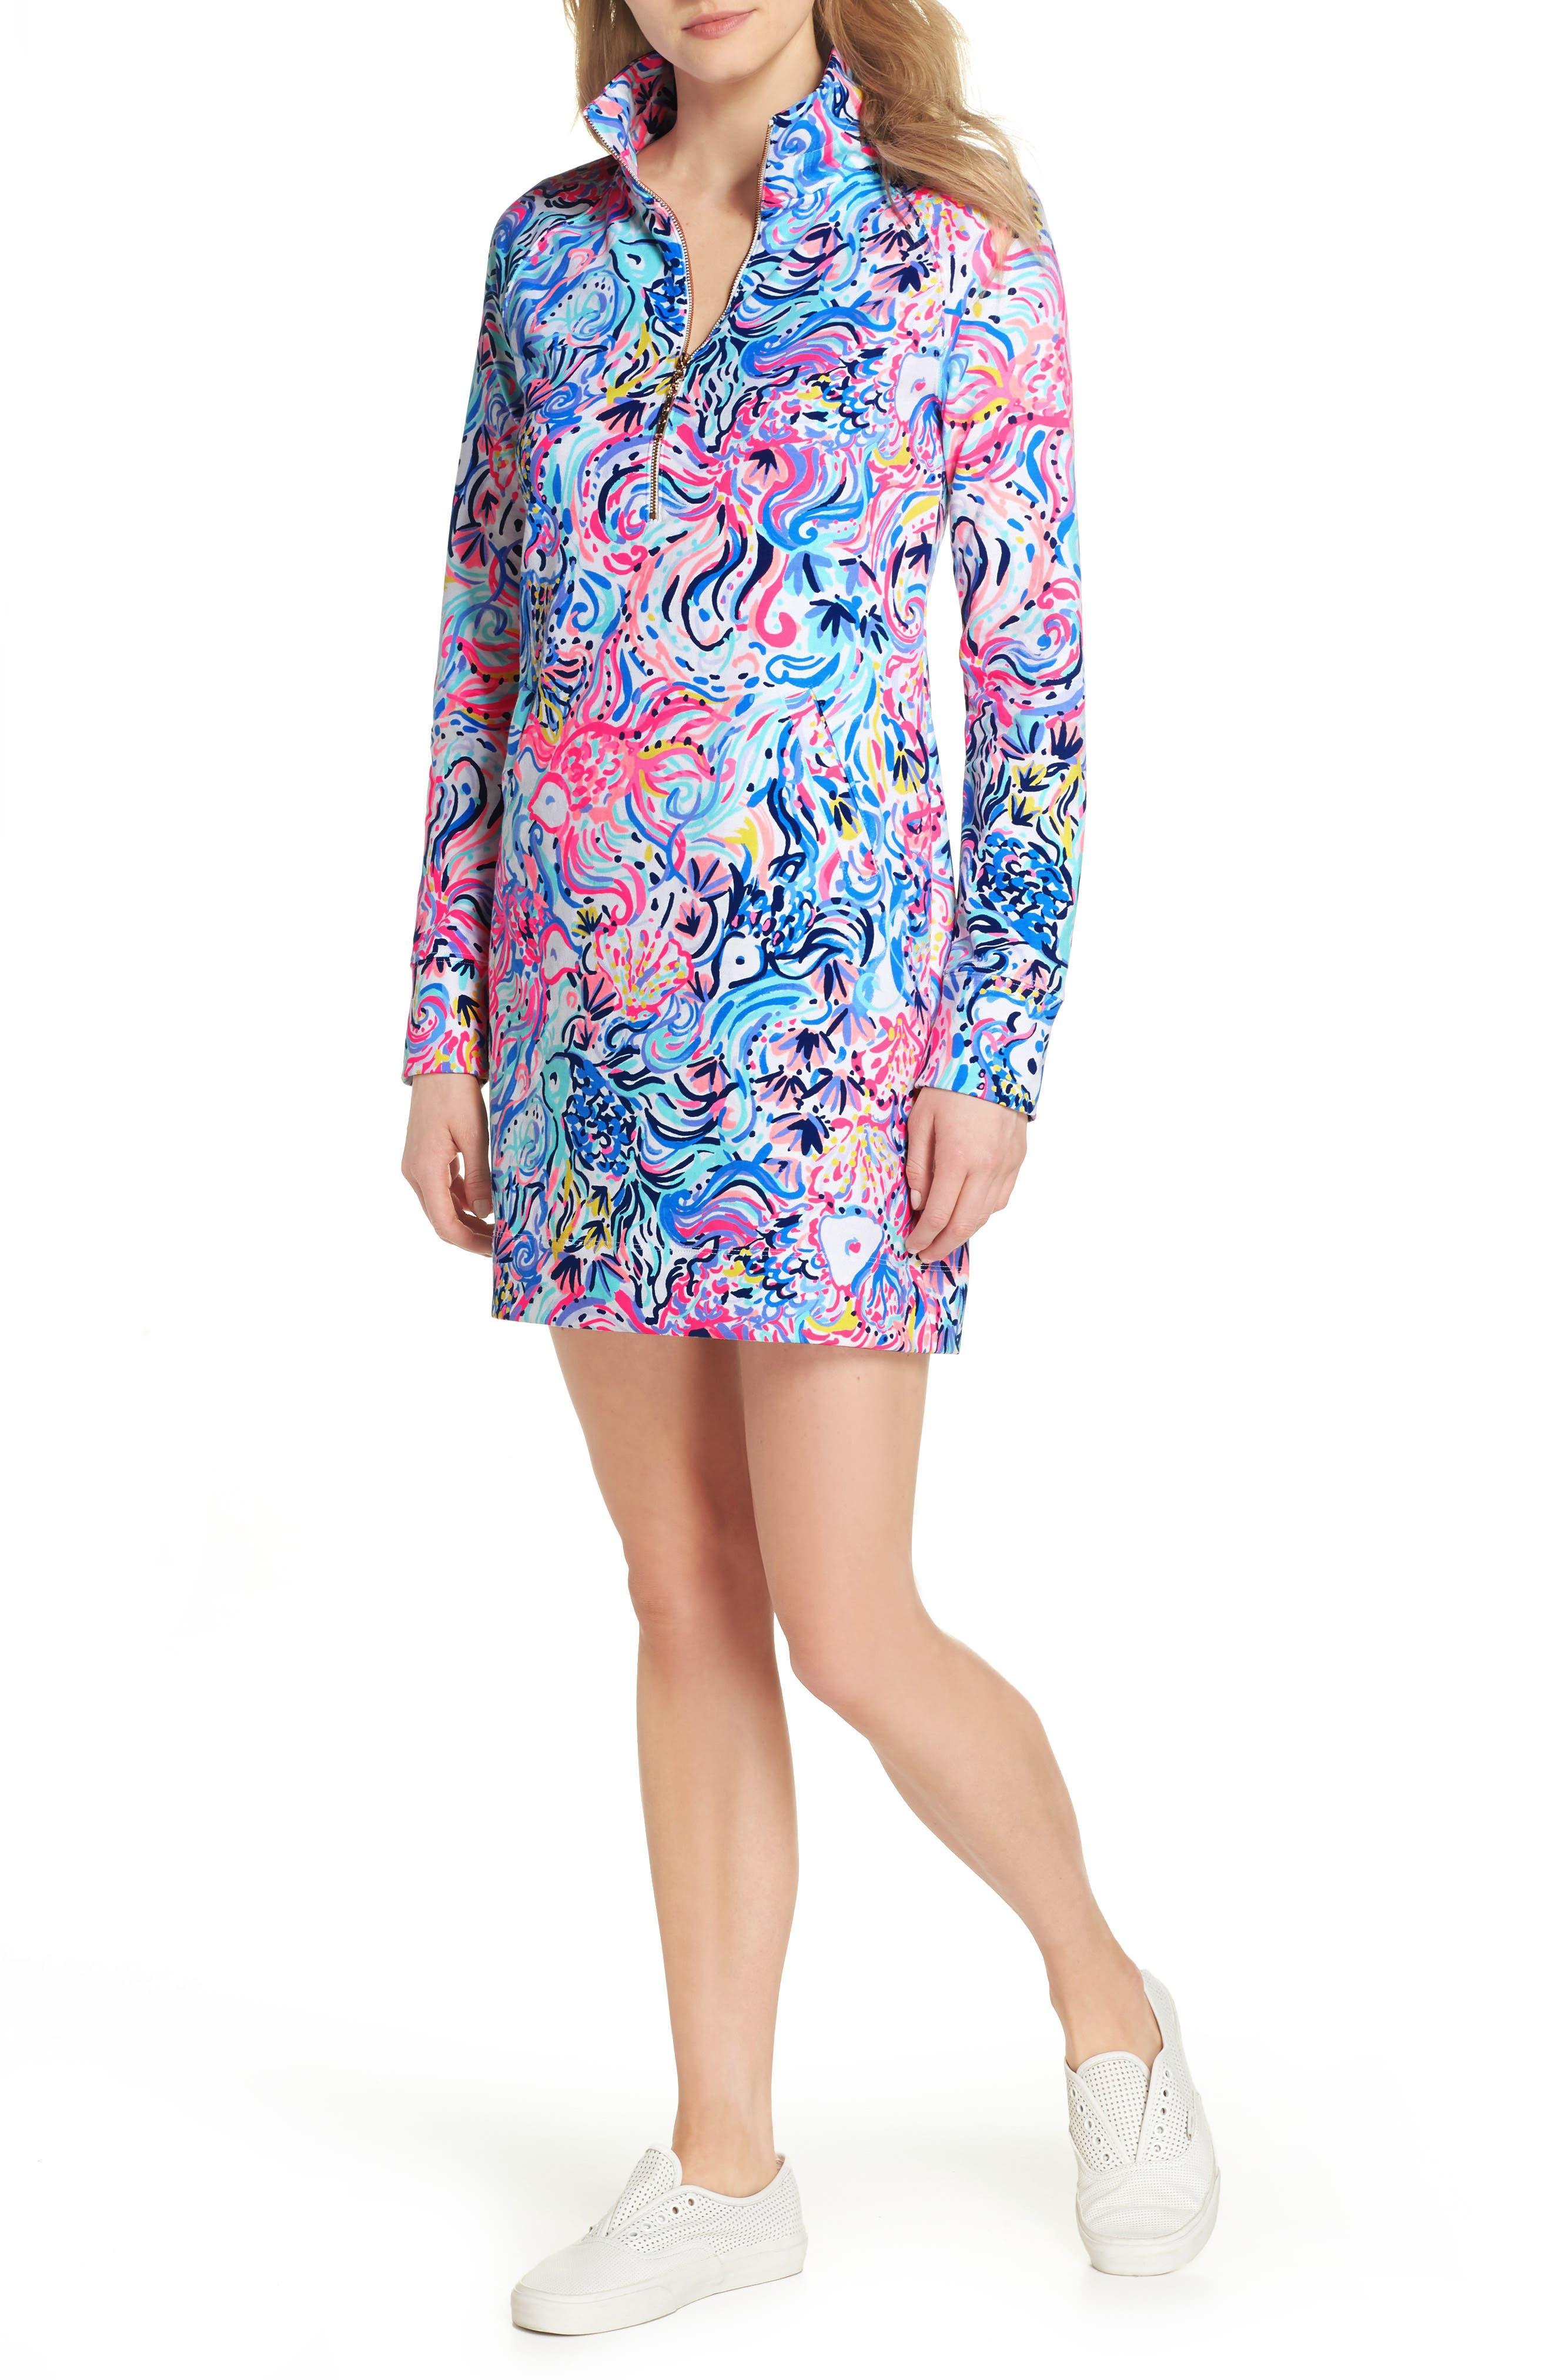 Skipper UPF 50+ Dress,                             Main thumbnail 1, color,                             MULTI SO SOPHISHTICATED